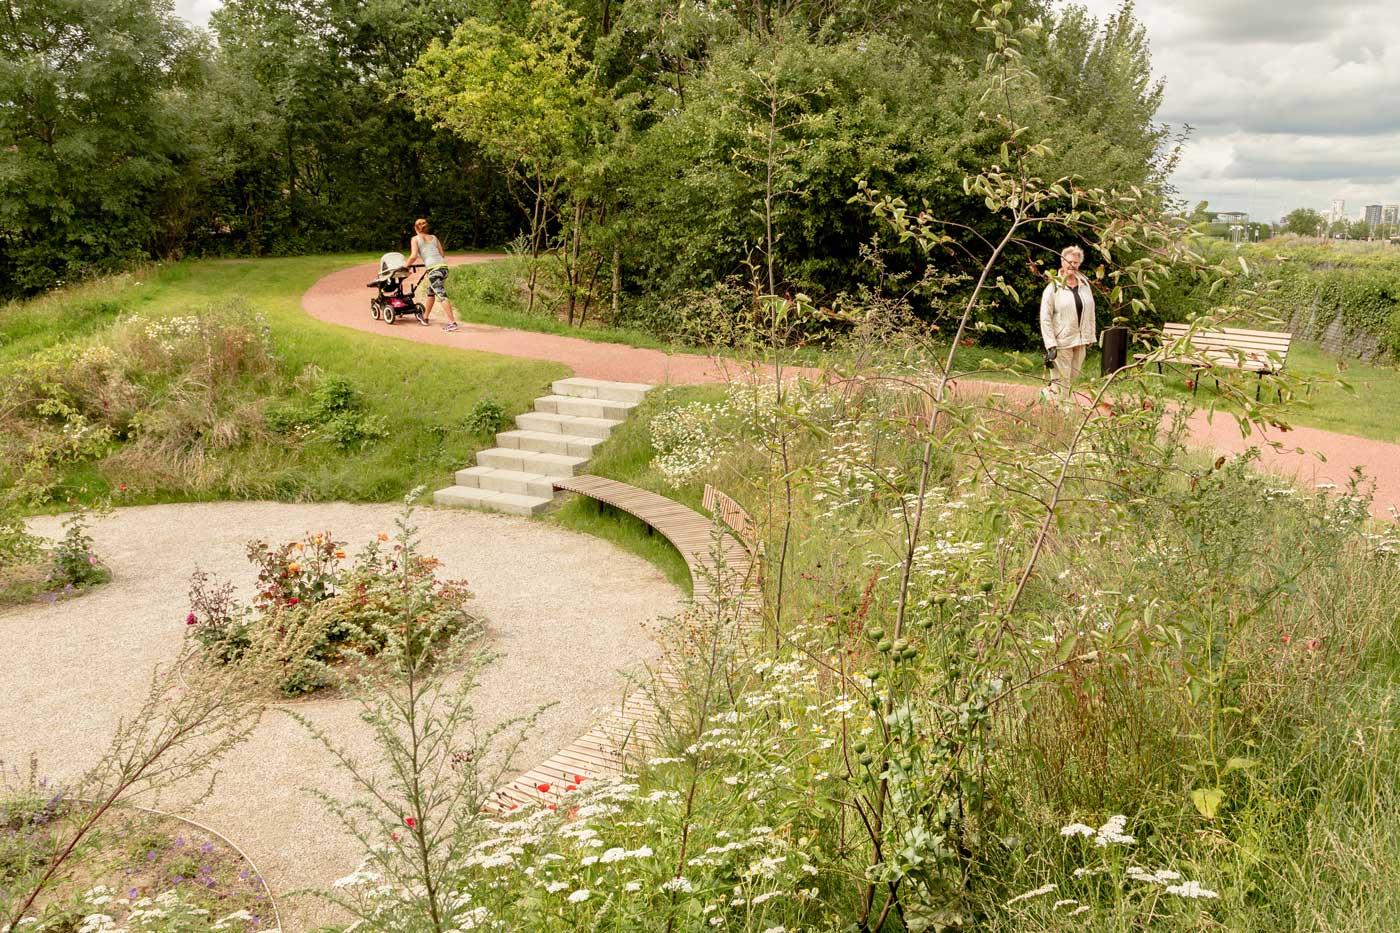 A park for everyone - Kastrup Activity Landscape